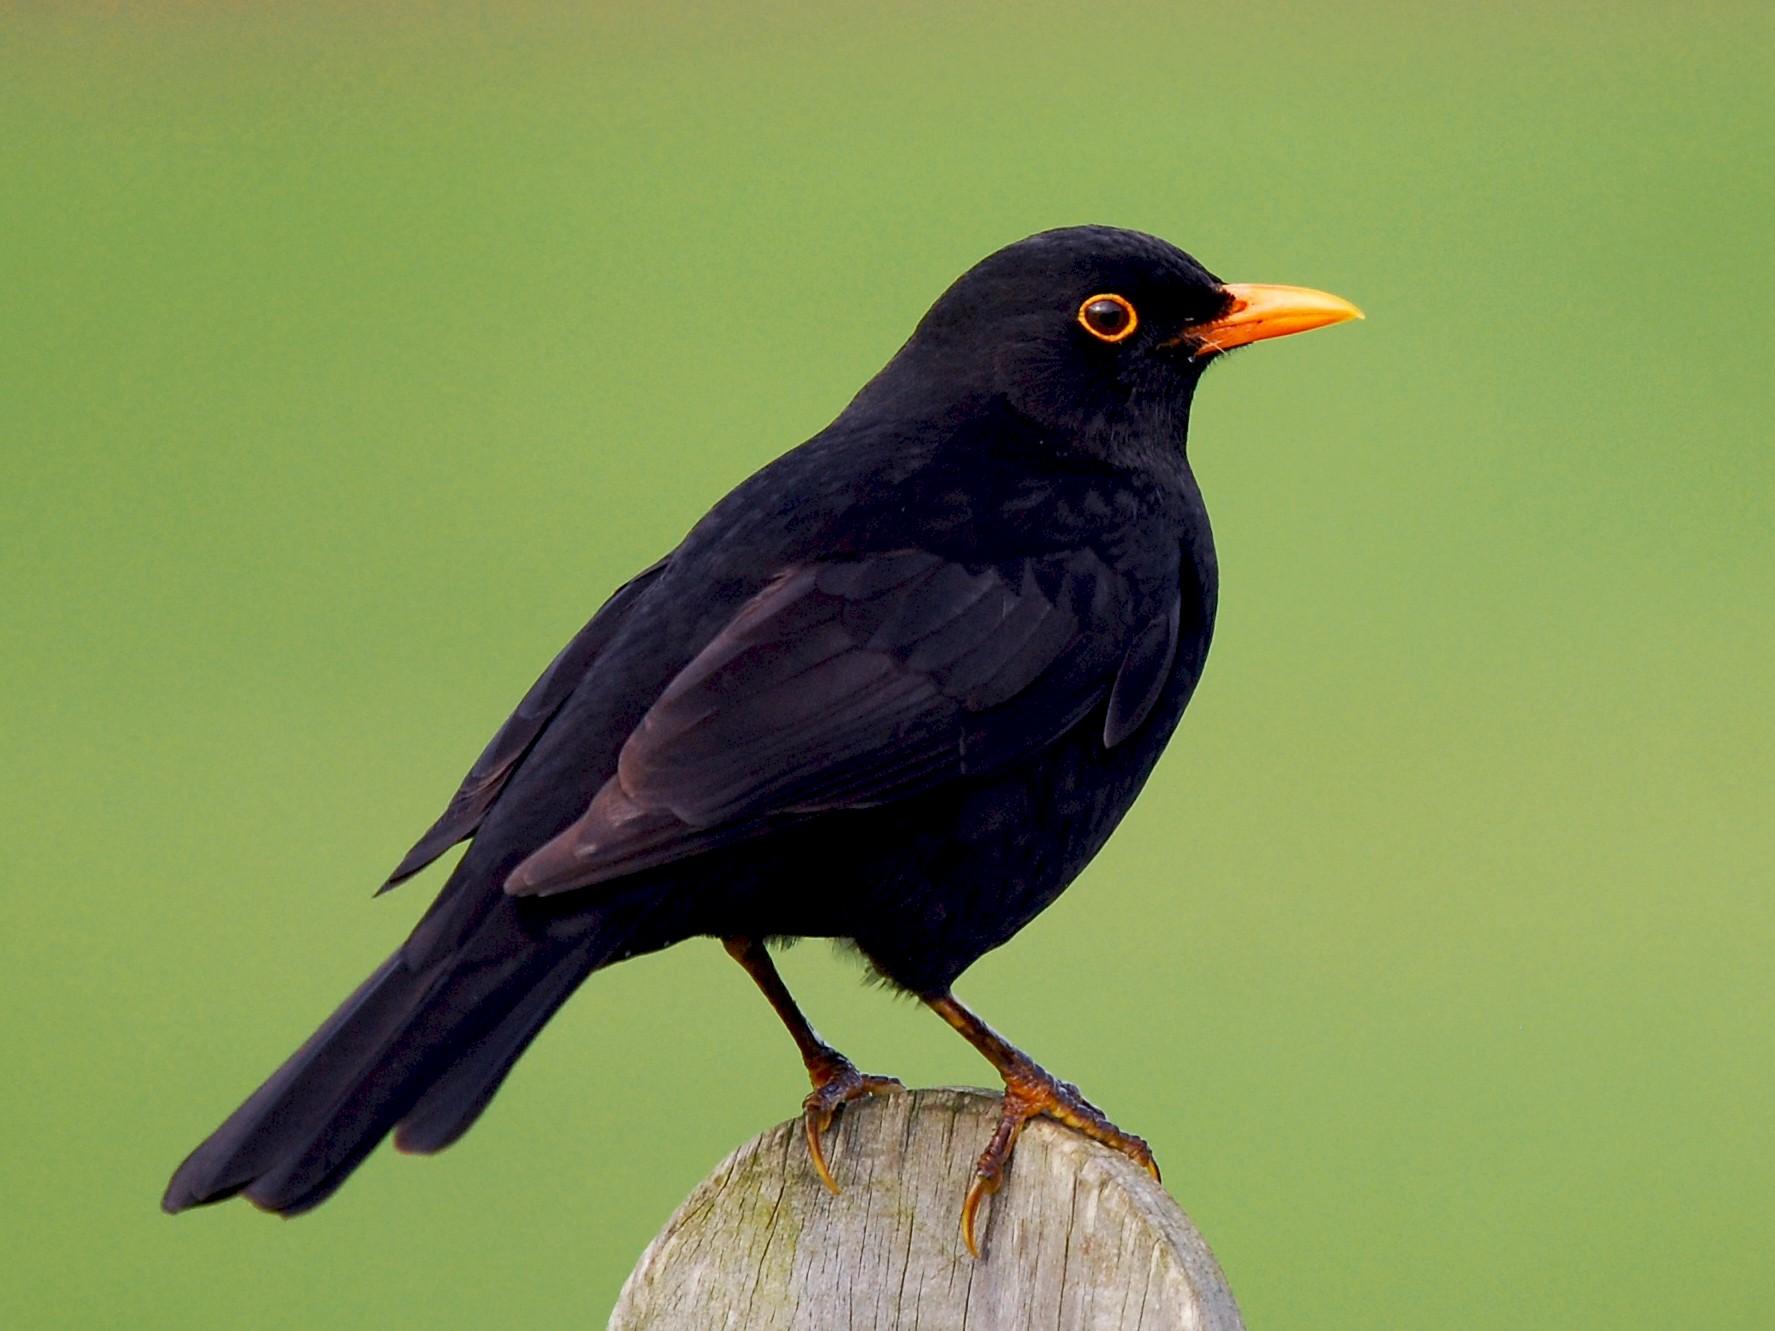 Eurasian Blackbird - eBird